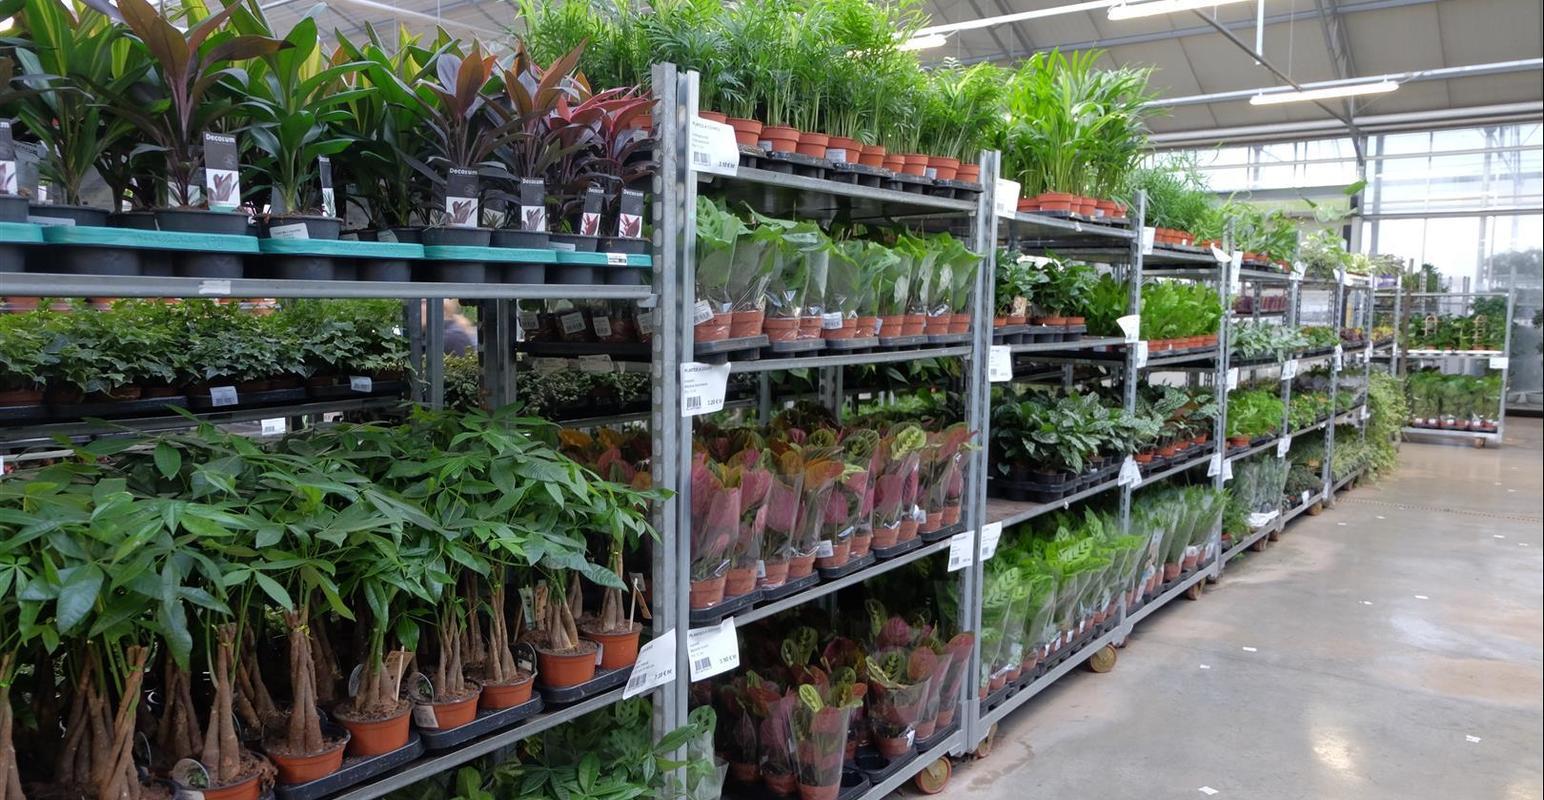 grossiste fleurs Rhône, grossiste plantes Rhône,